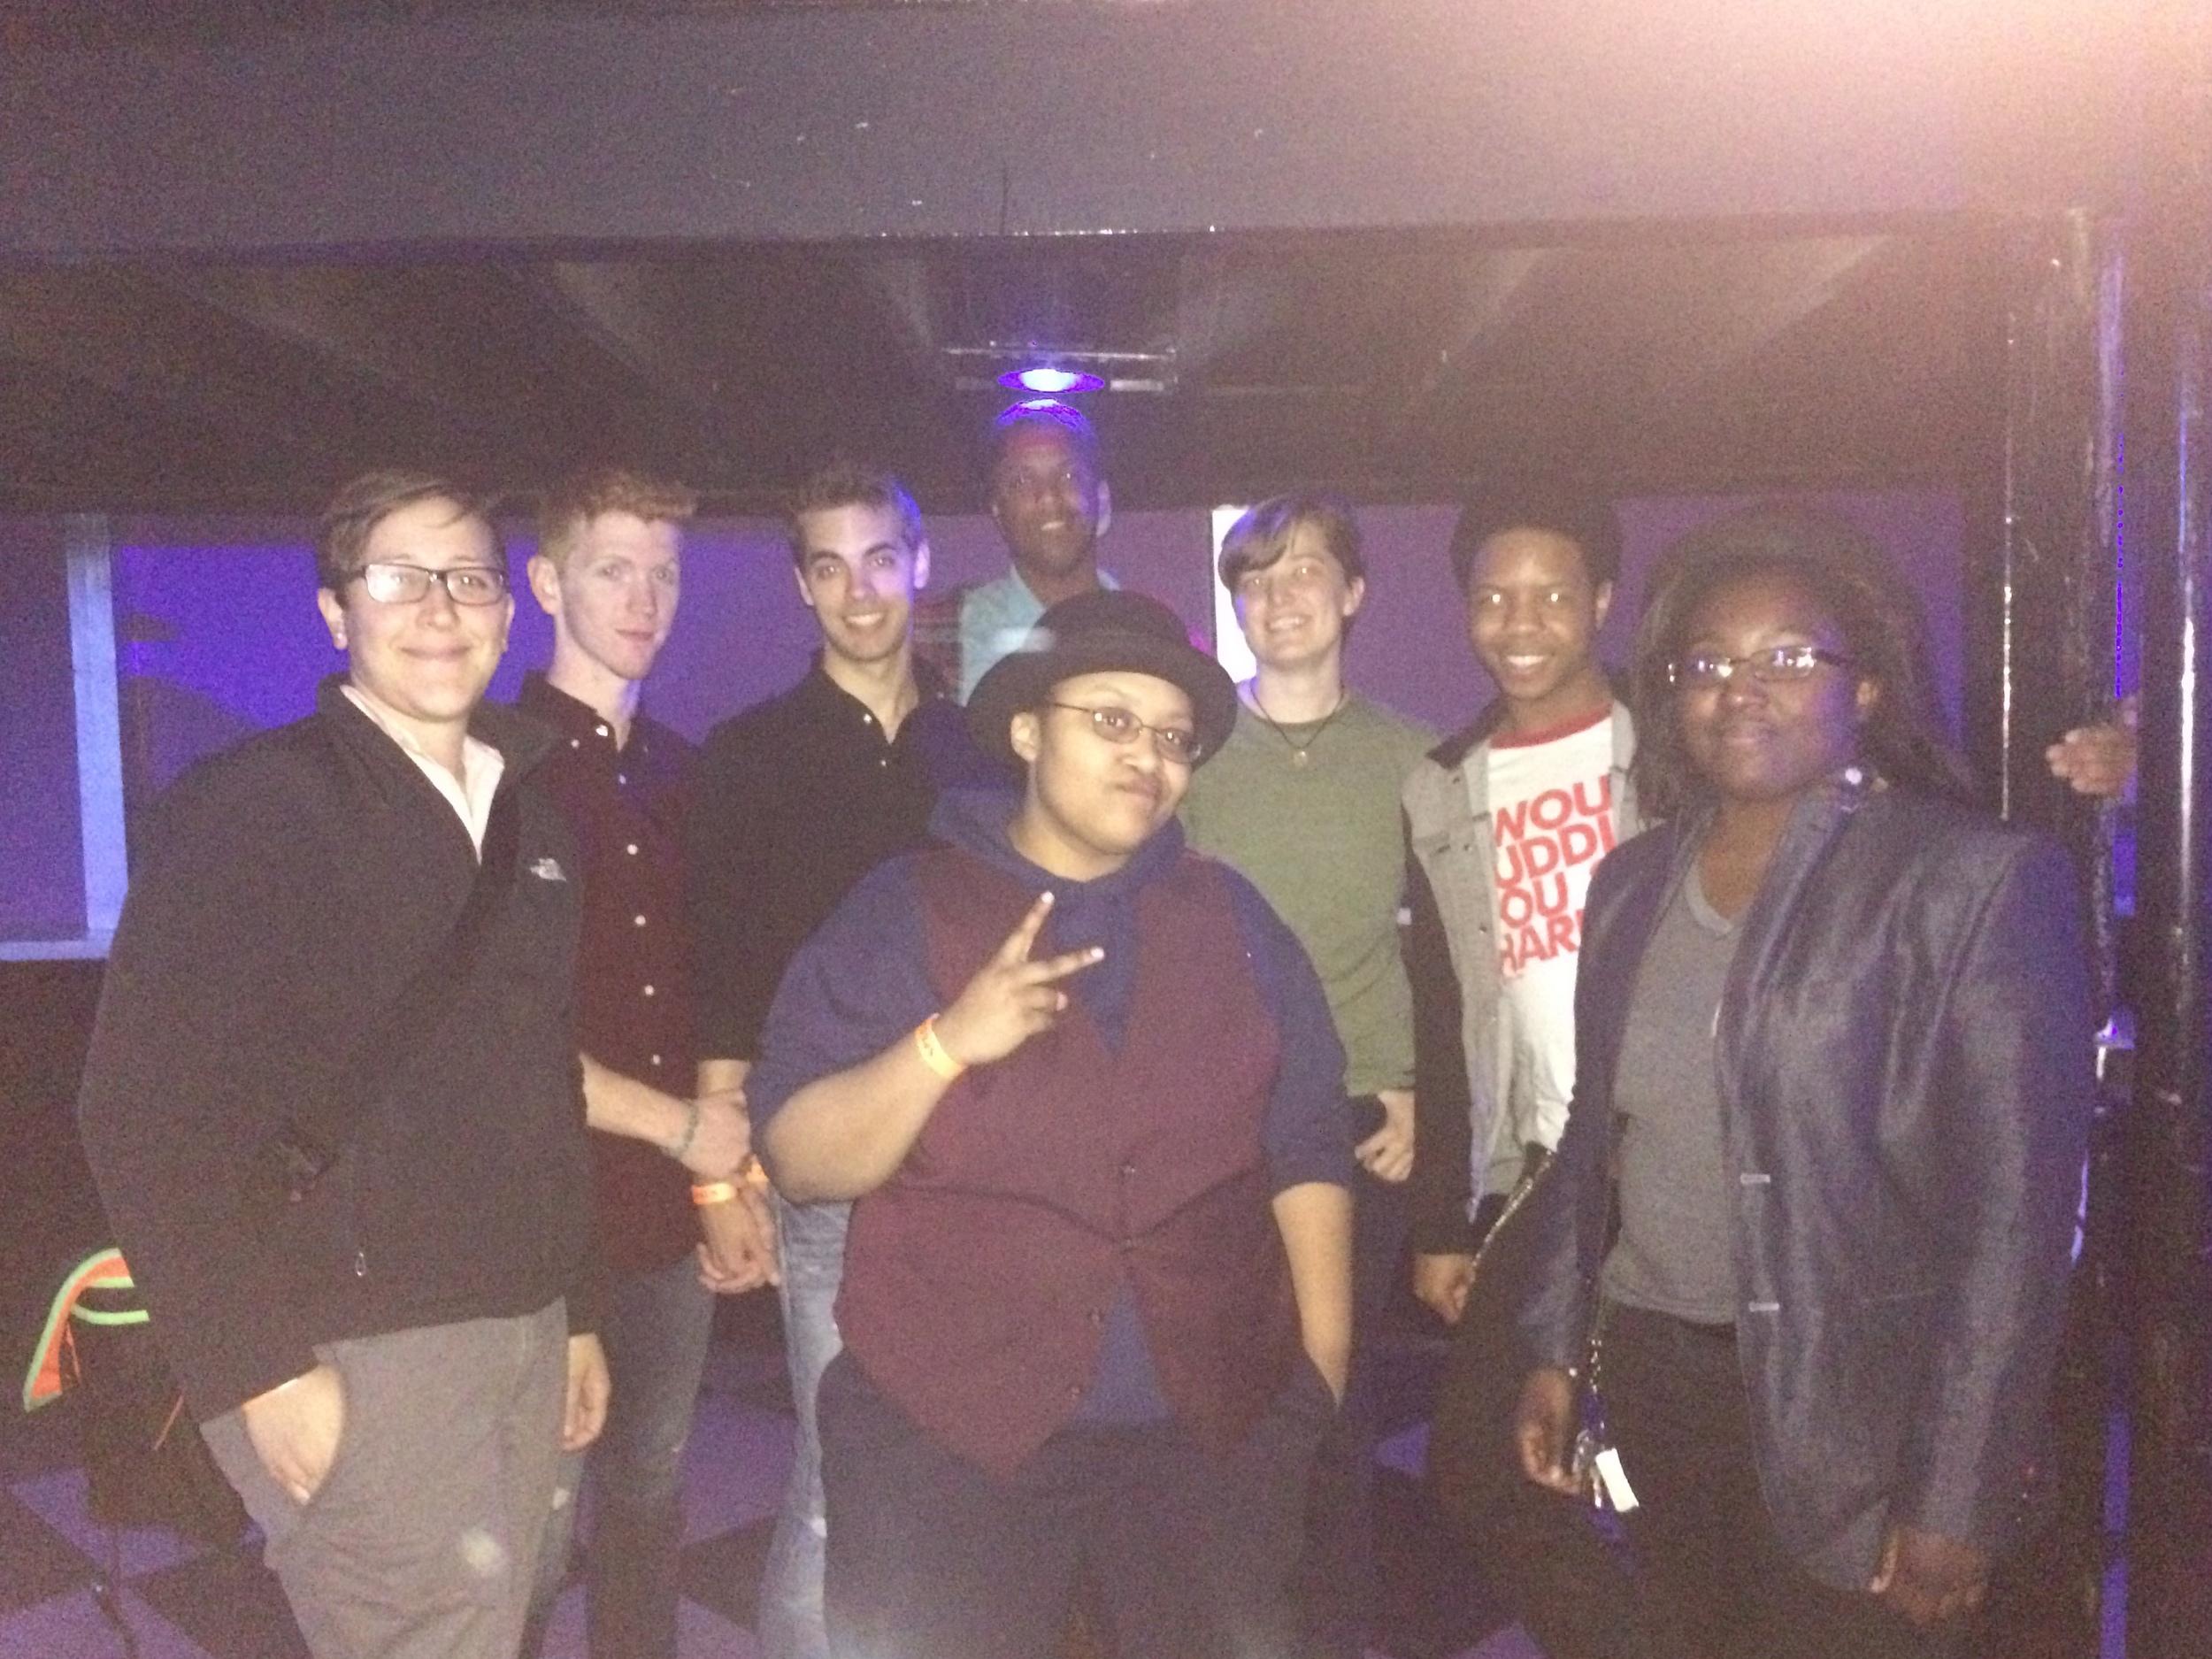 Members of Memphis Gay & Lesbian Community Center PRYSM Group